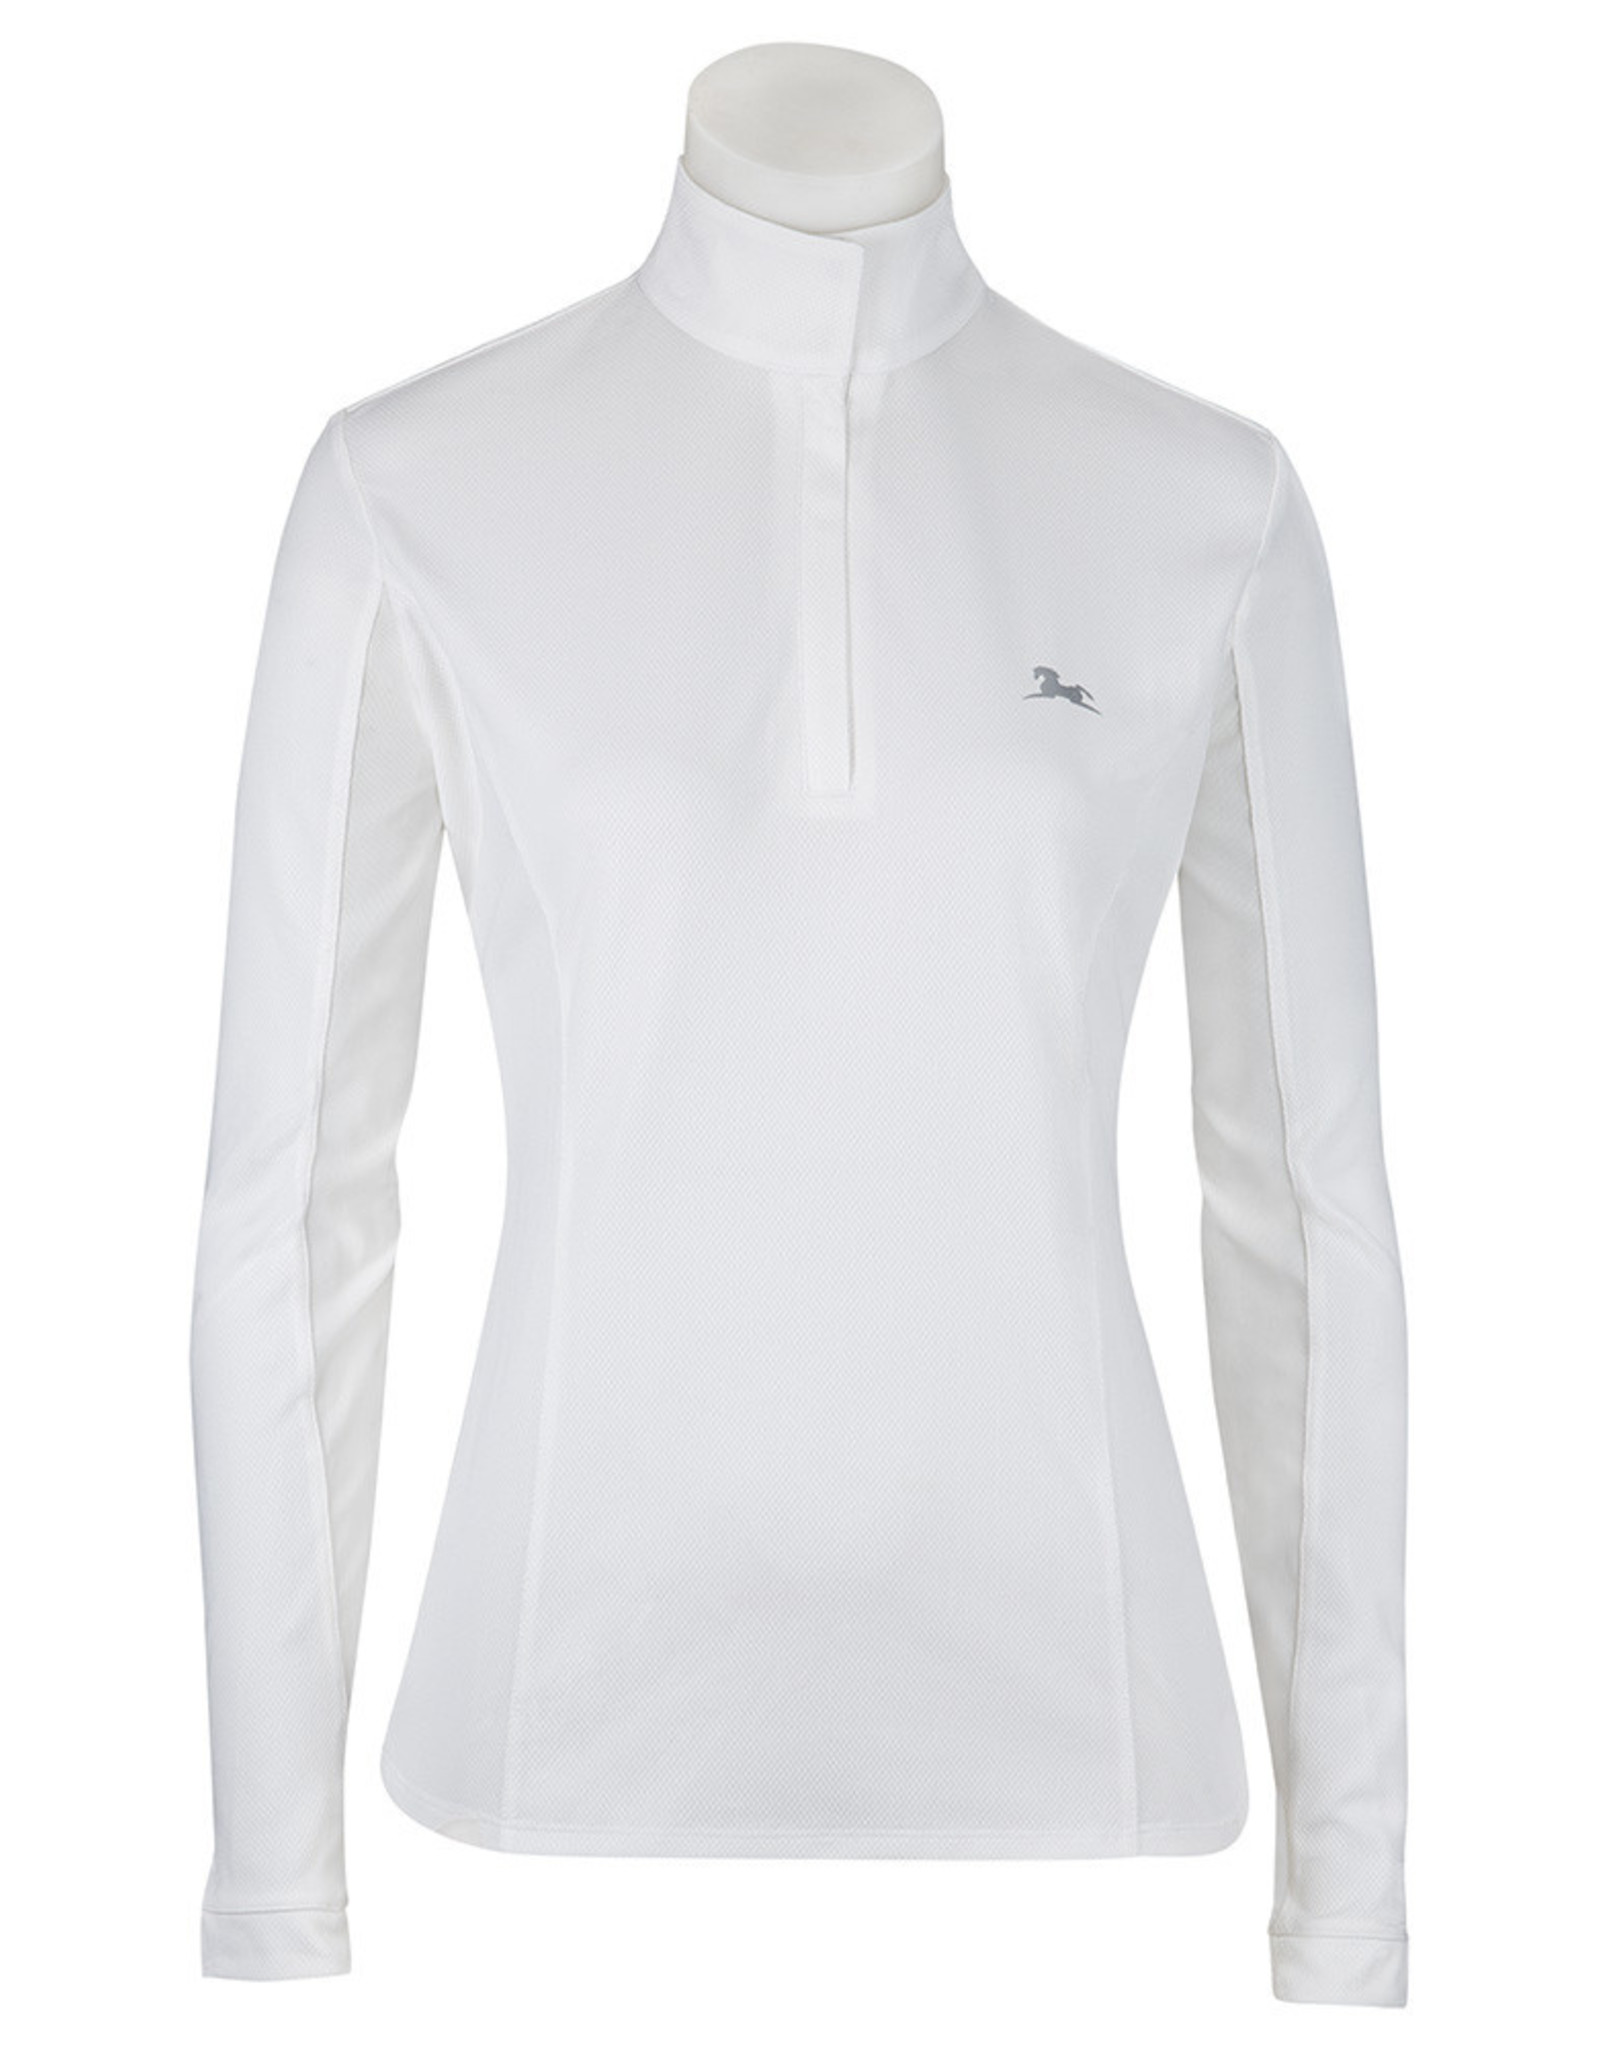 RJ CLASSICS Janie Ladies' Long Sleeve Show Shirt